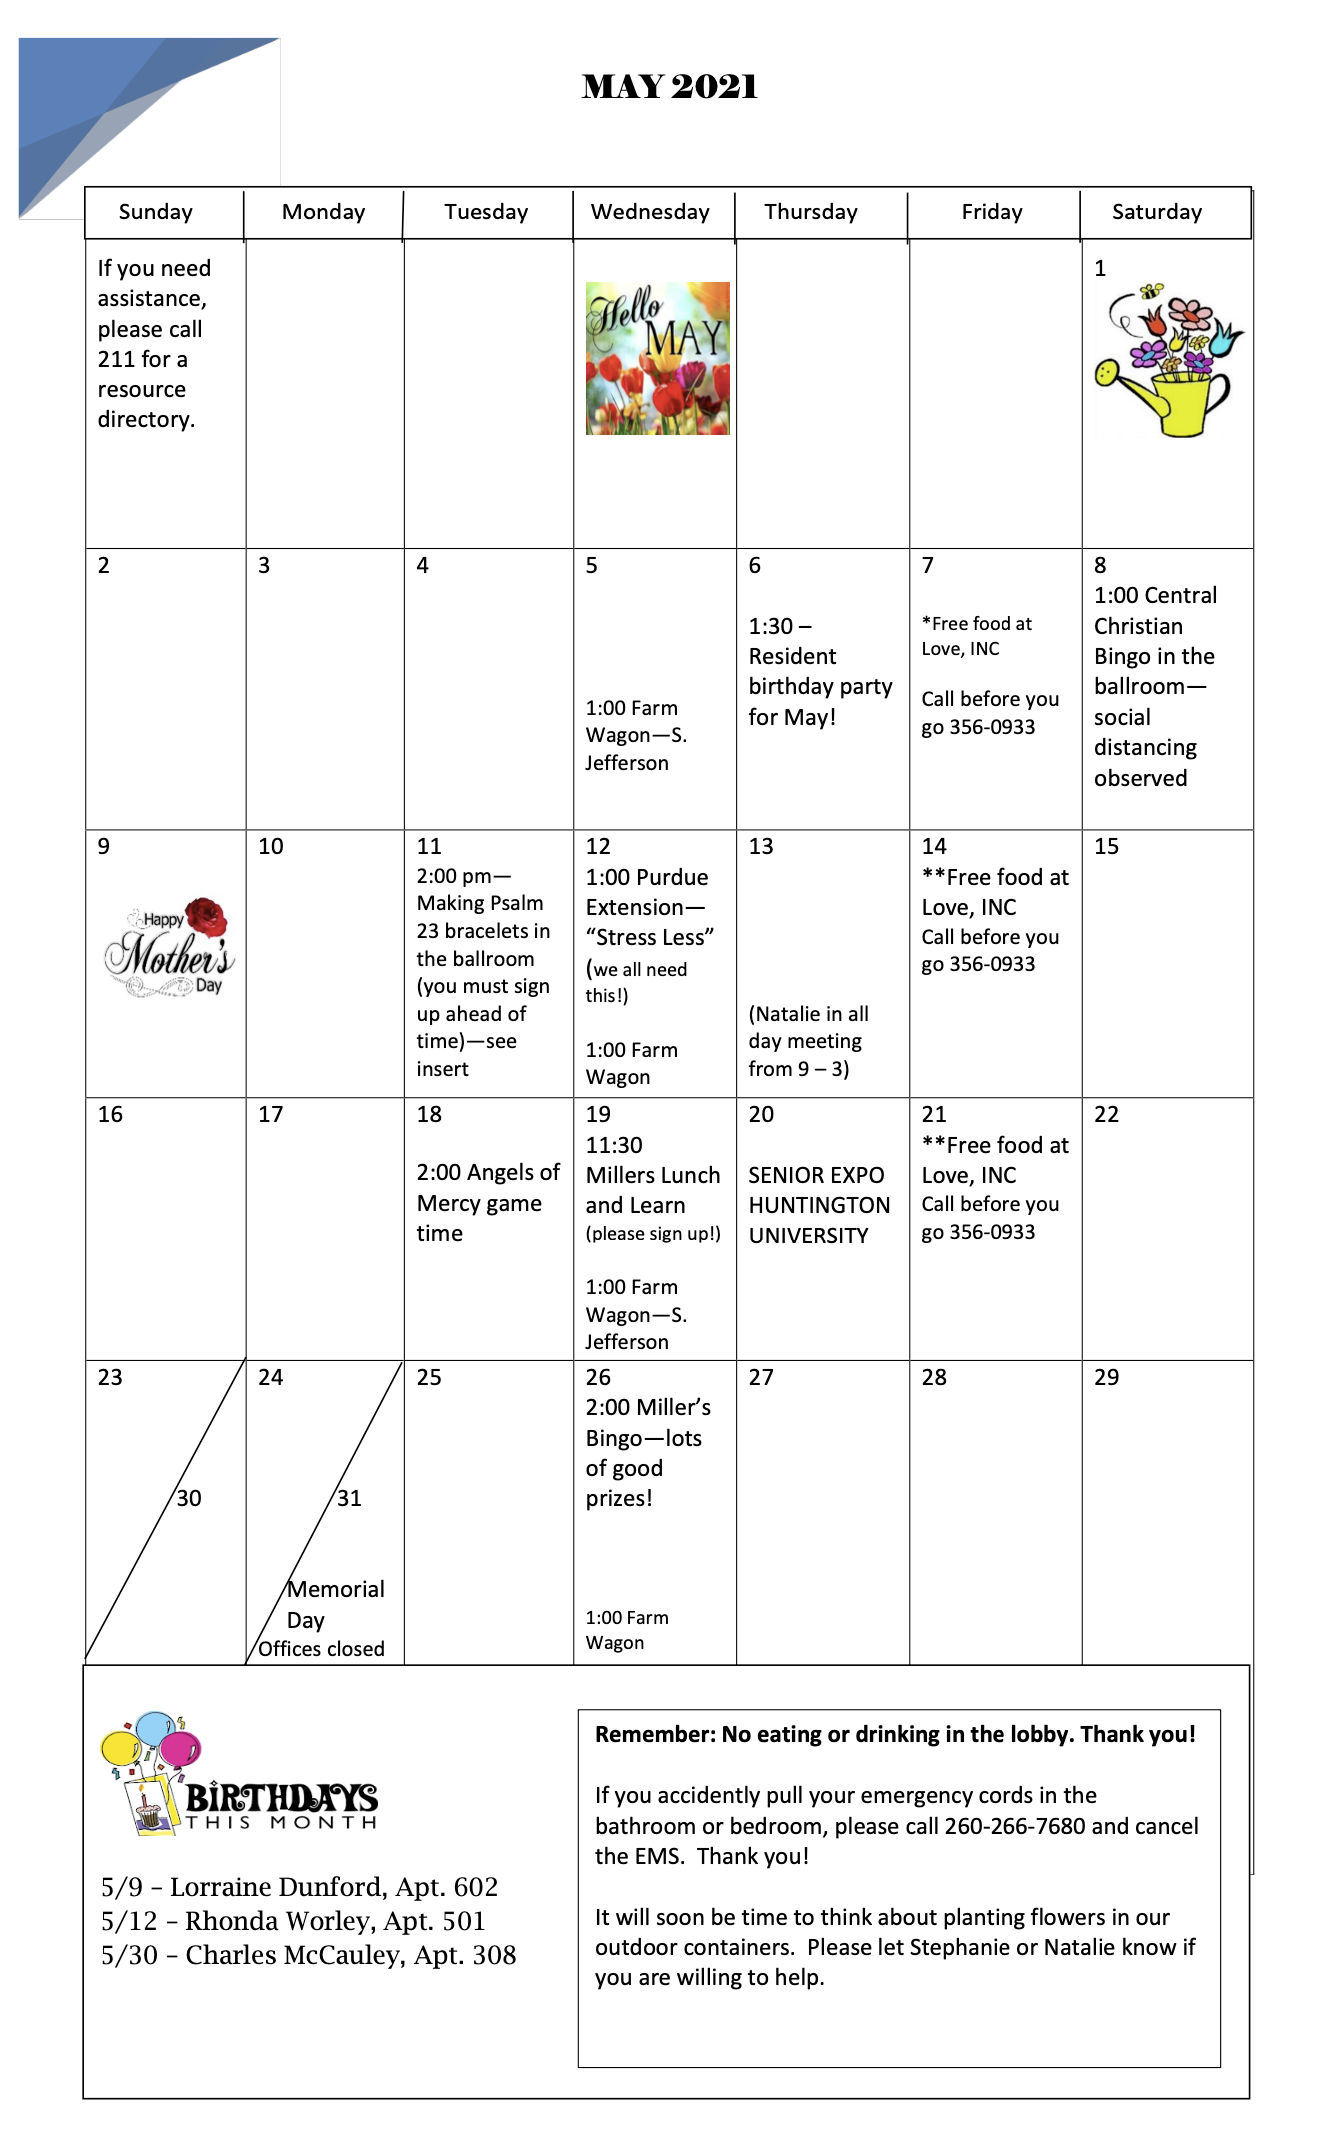 LaFonatine May Calendar